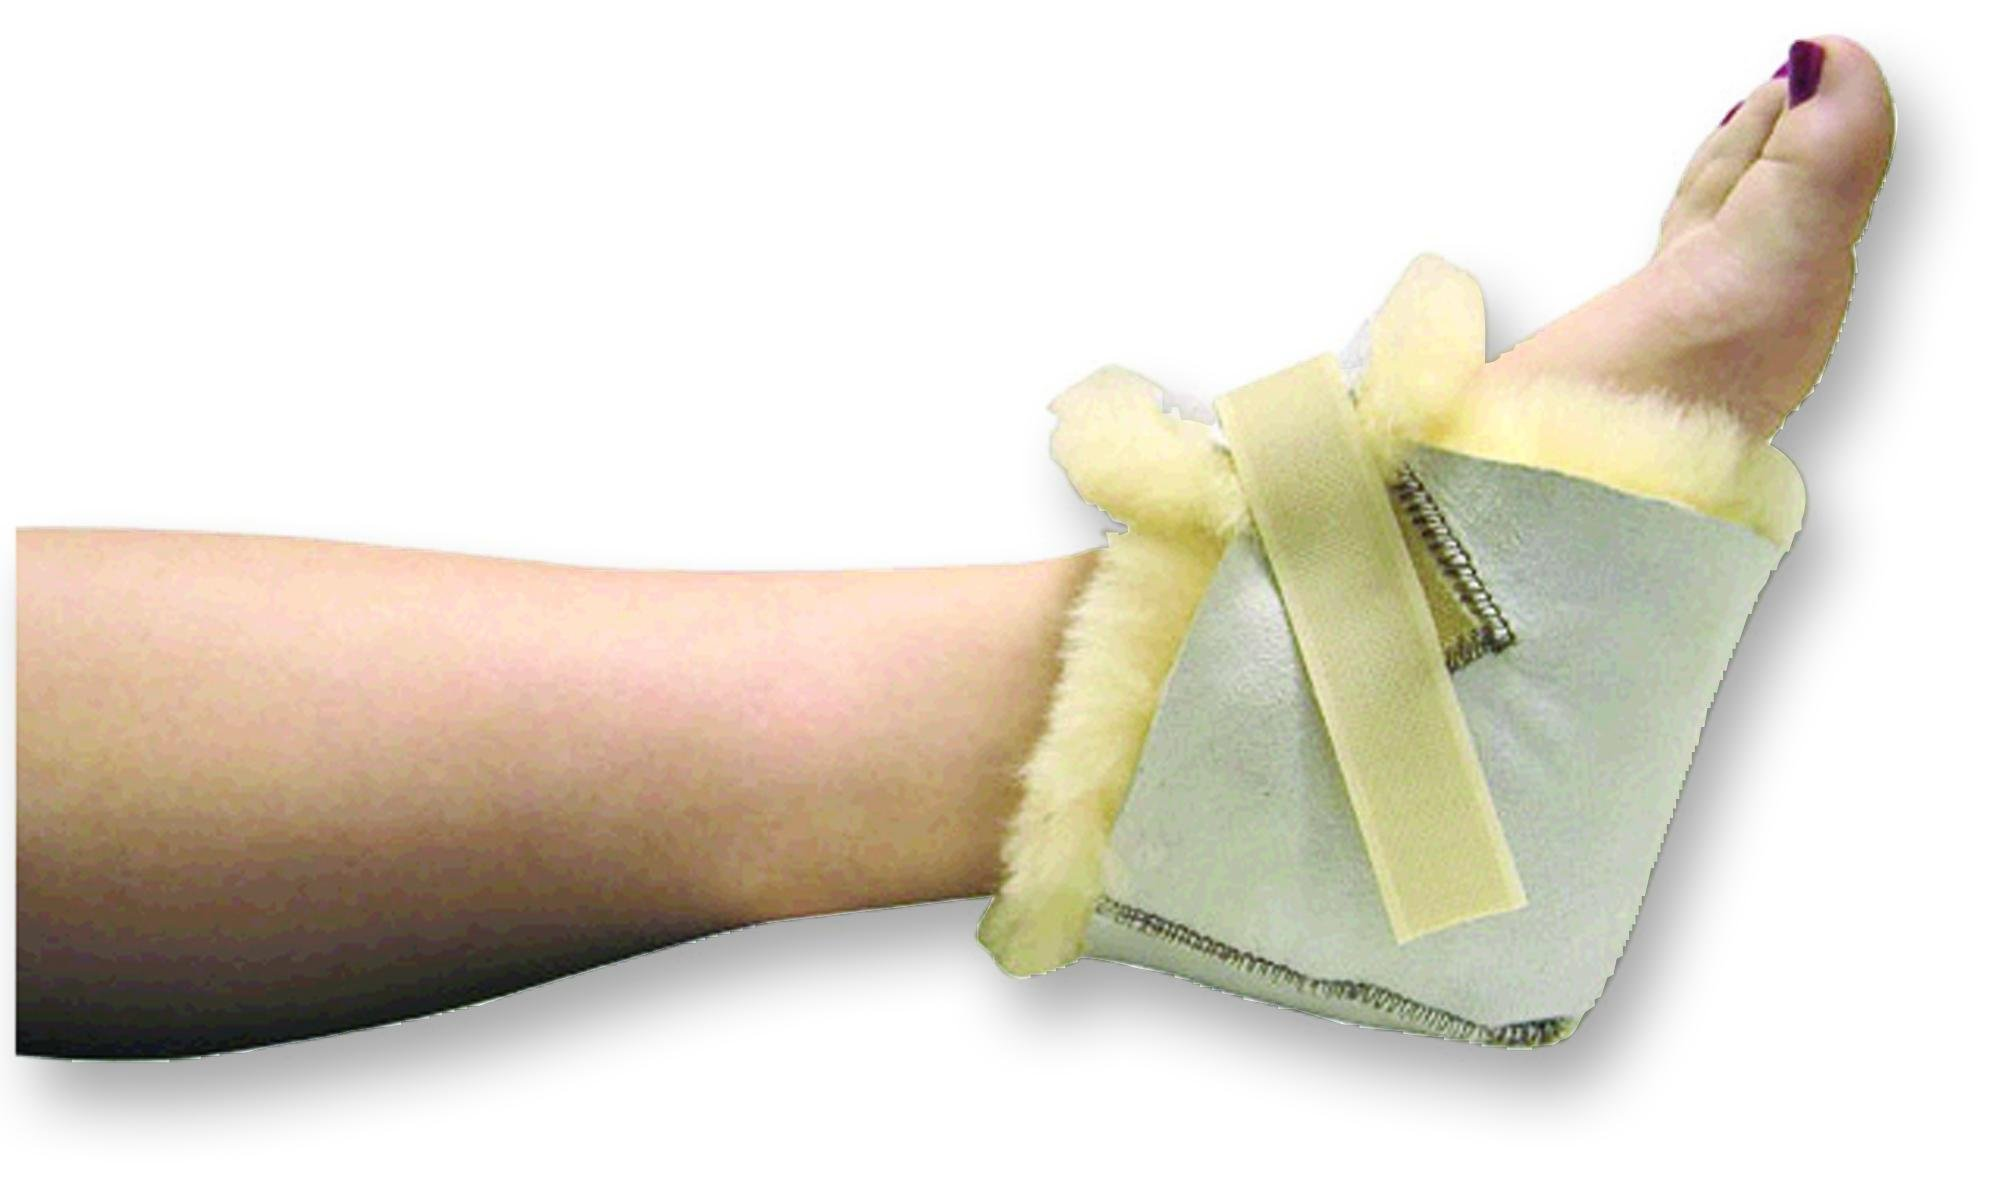 Indemed SHP103 Sofsheep Sheepskin Heel Protector